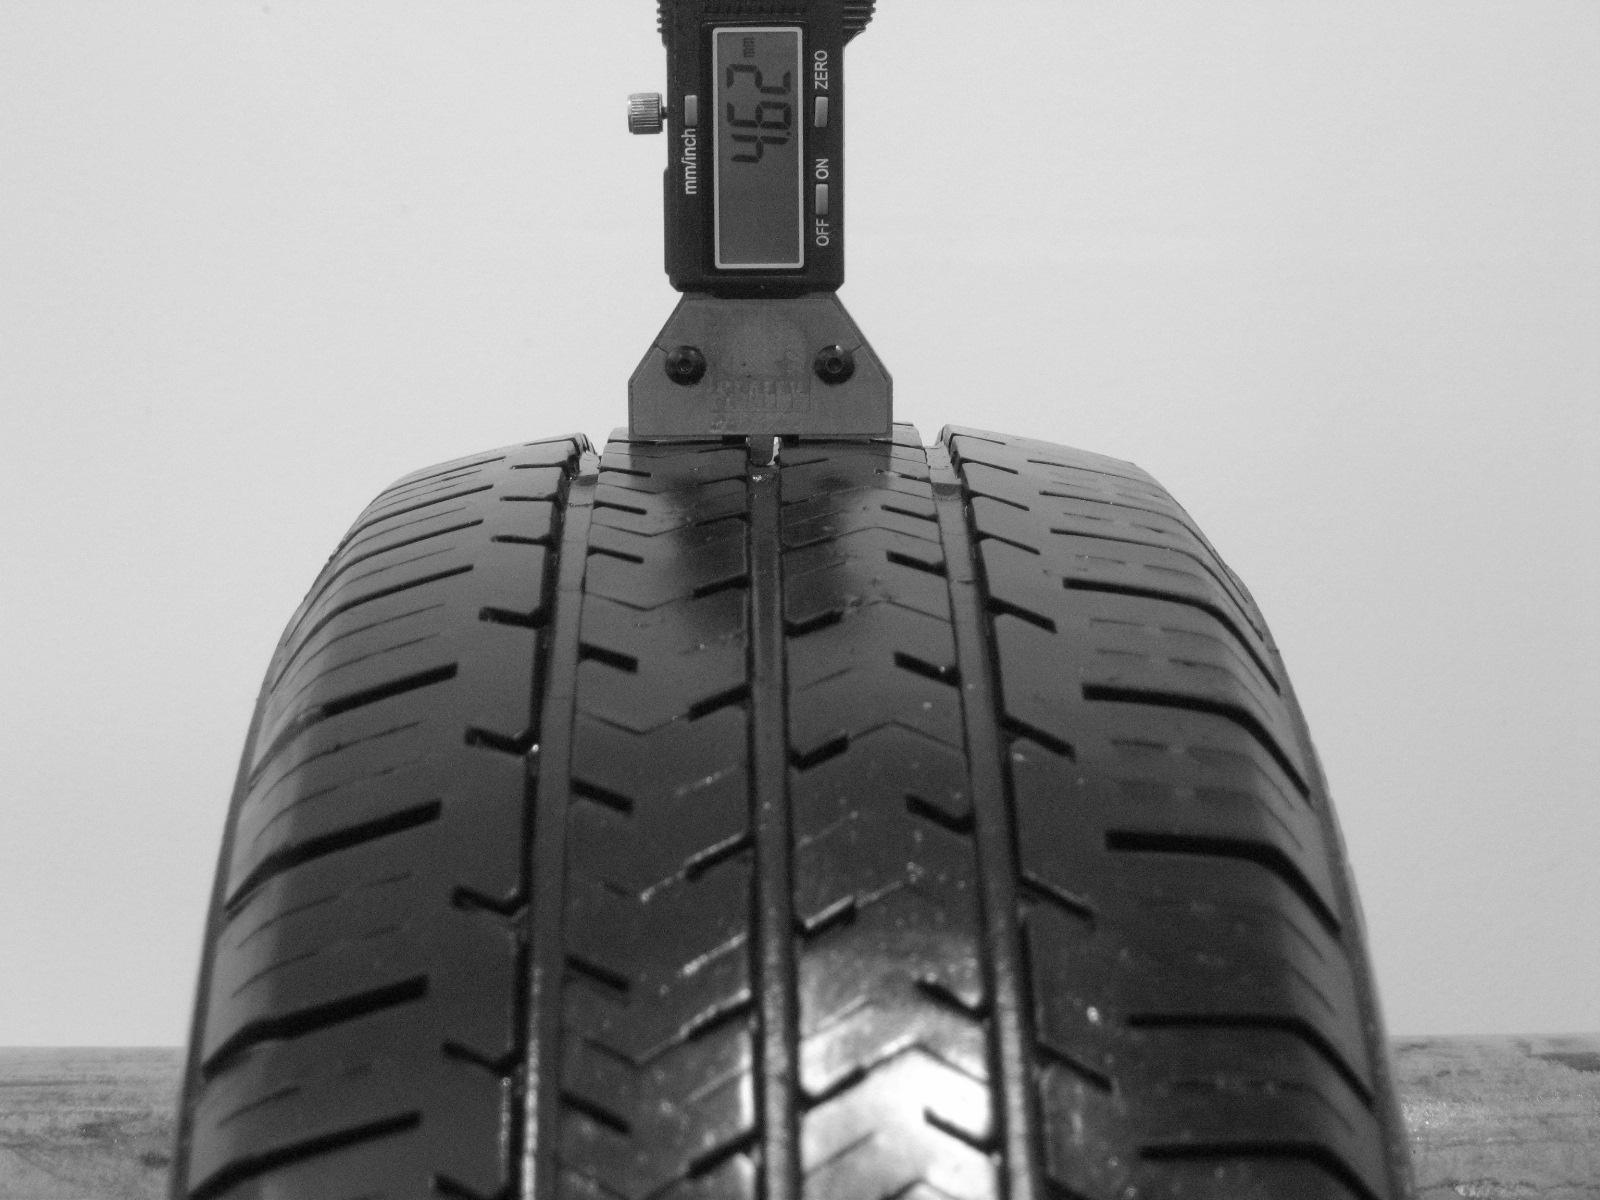 Použité-Pneu-Bazar - 175/65 R14 MICHELIN AGILIS 41 -kusovka-rezerva 3mm